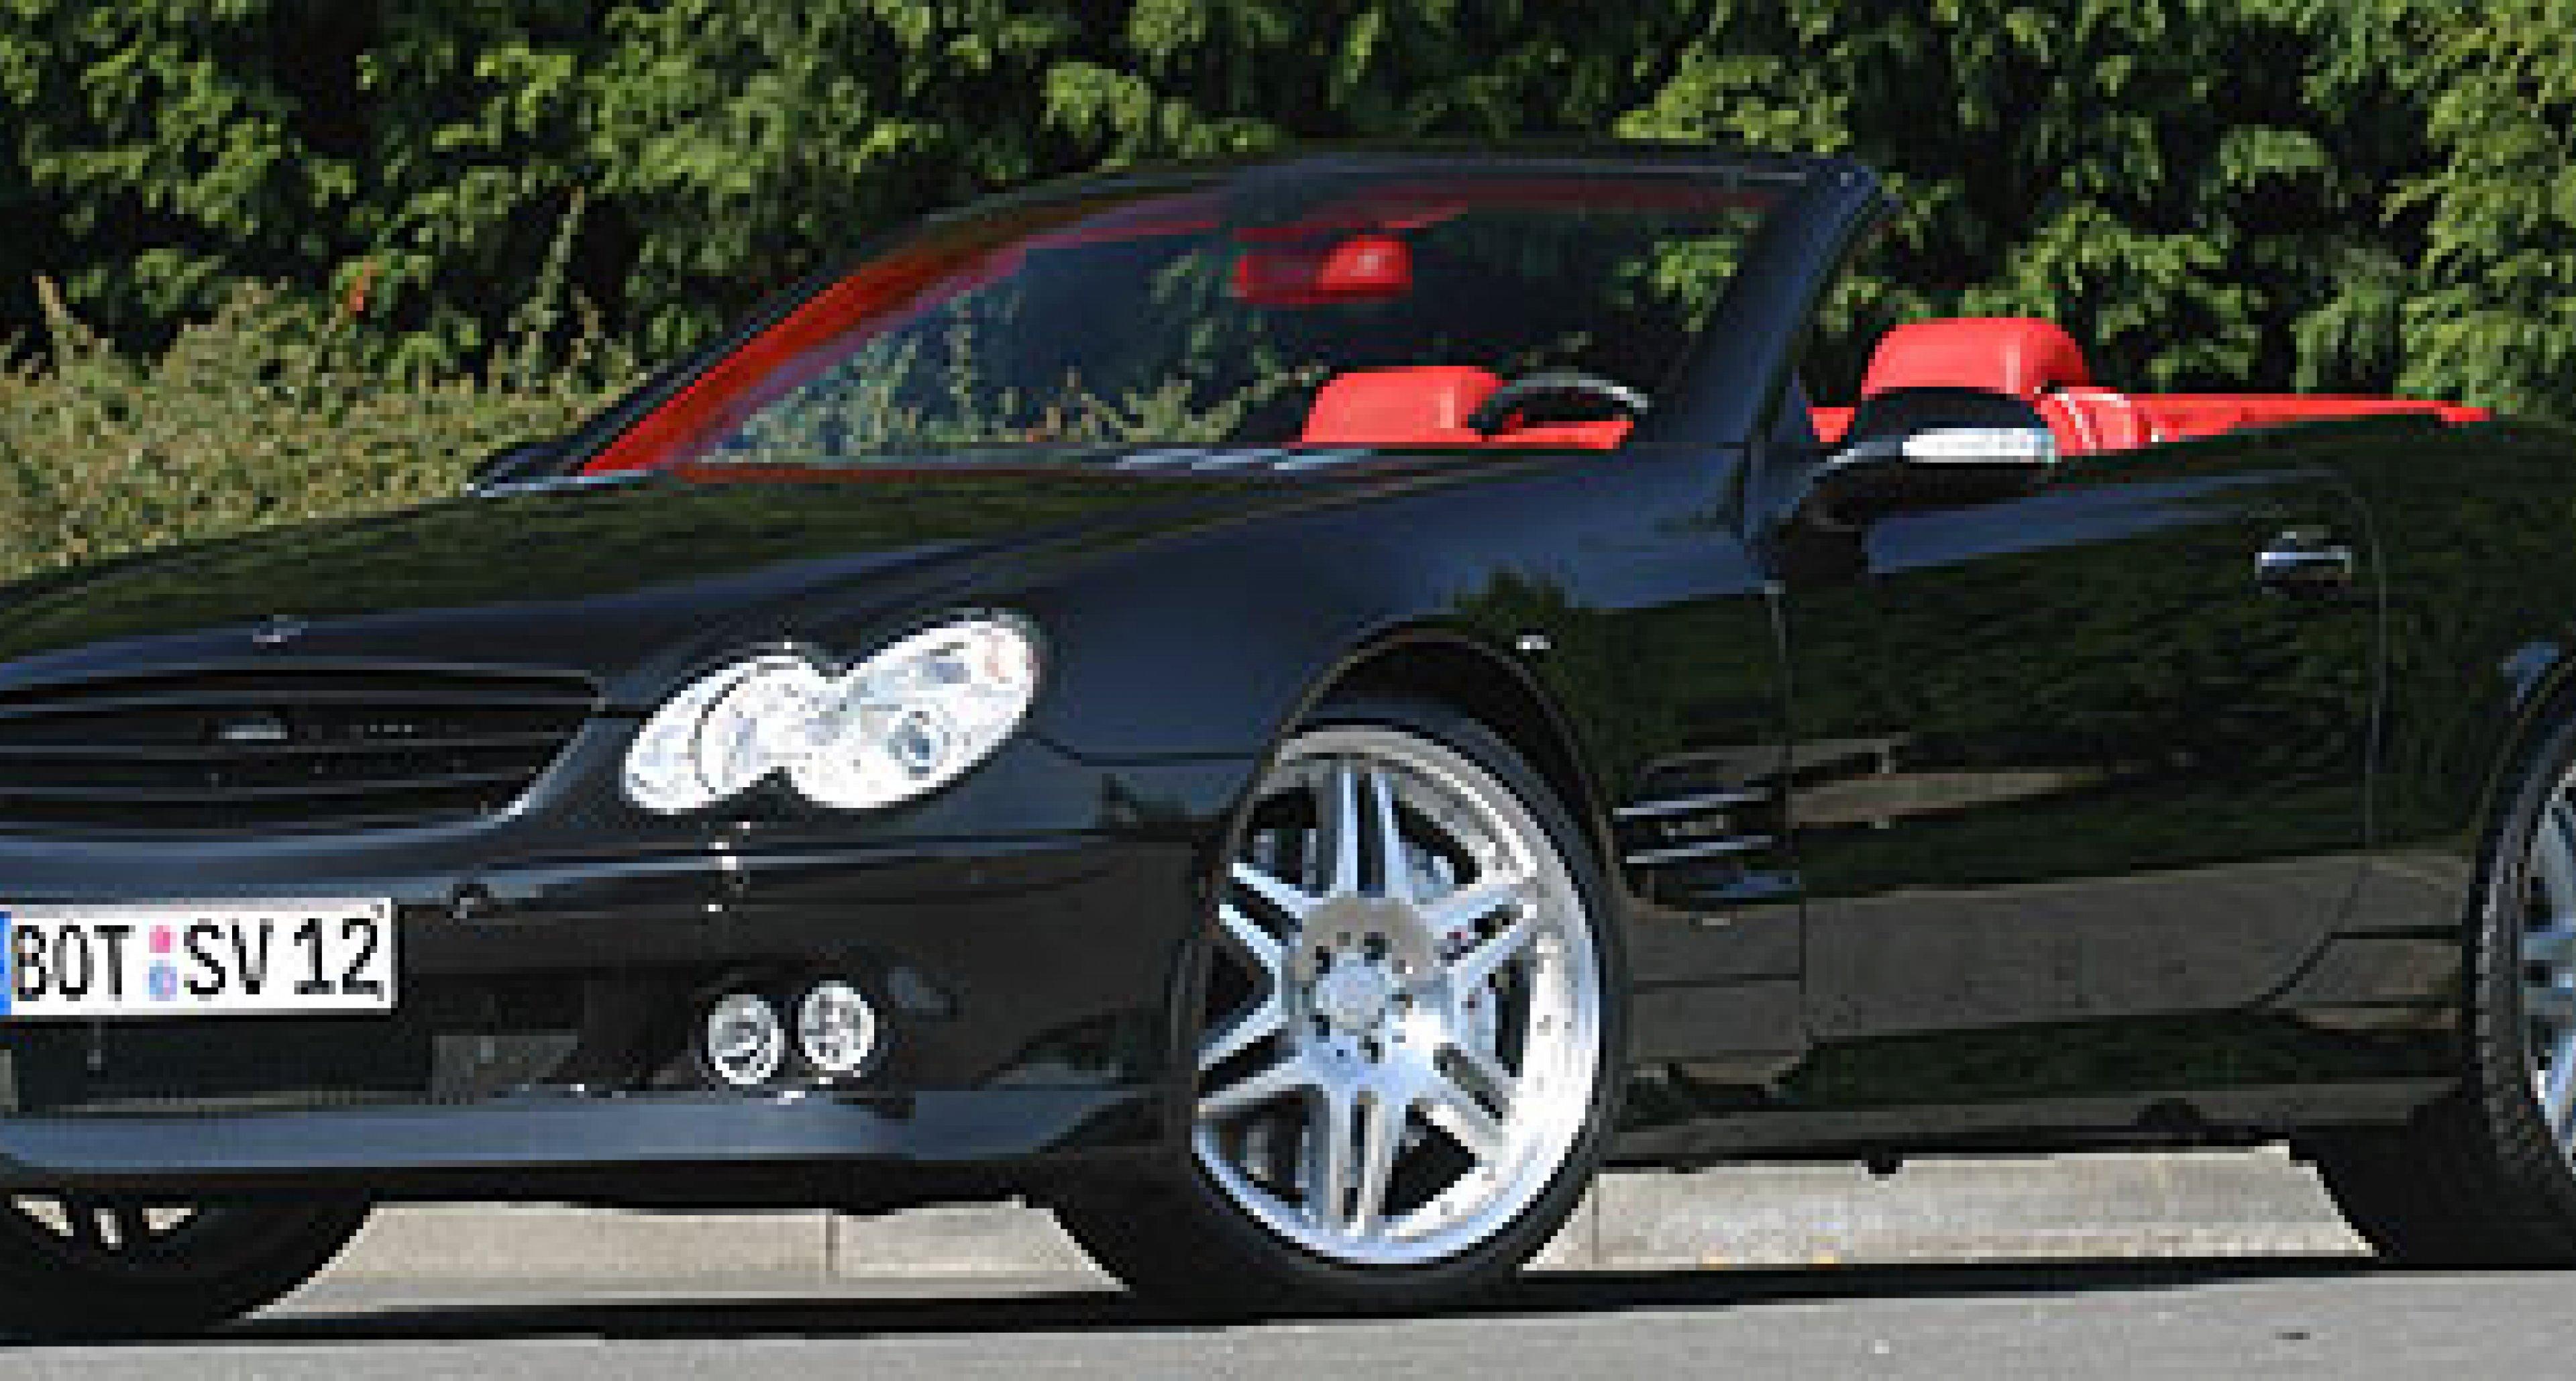 Brabus announce 640bhp Mercedes-Benz SV12